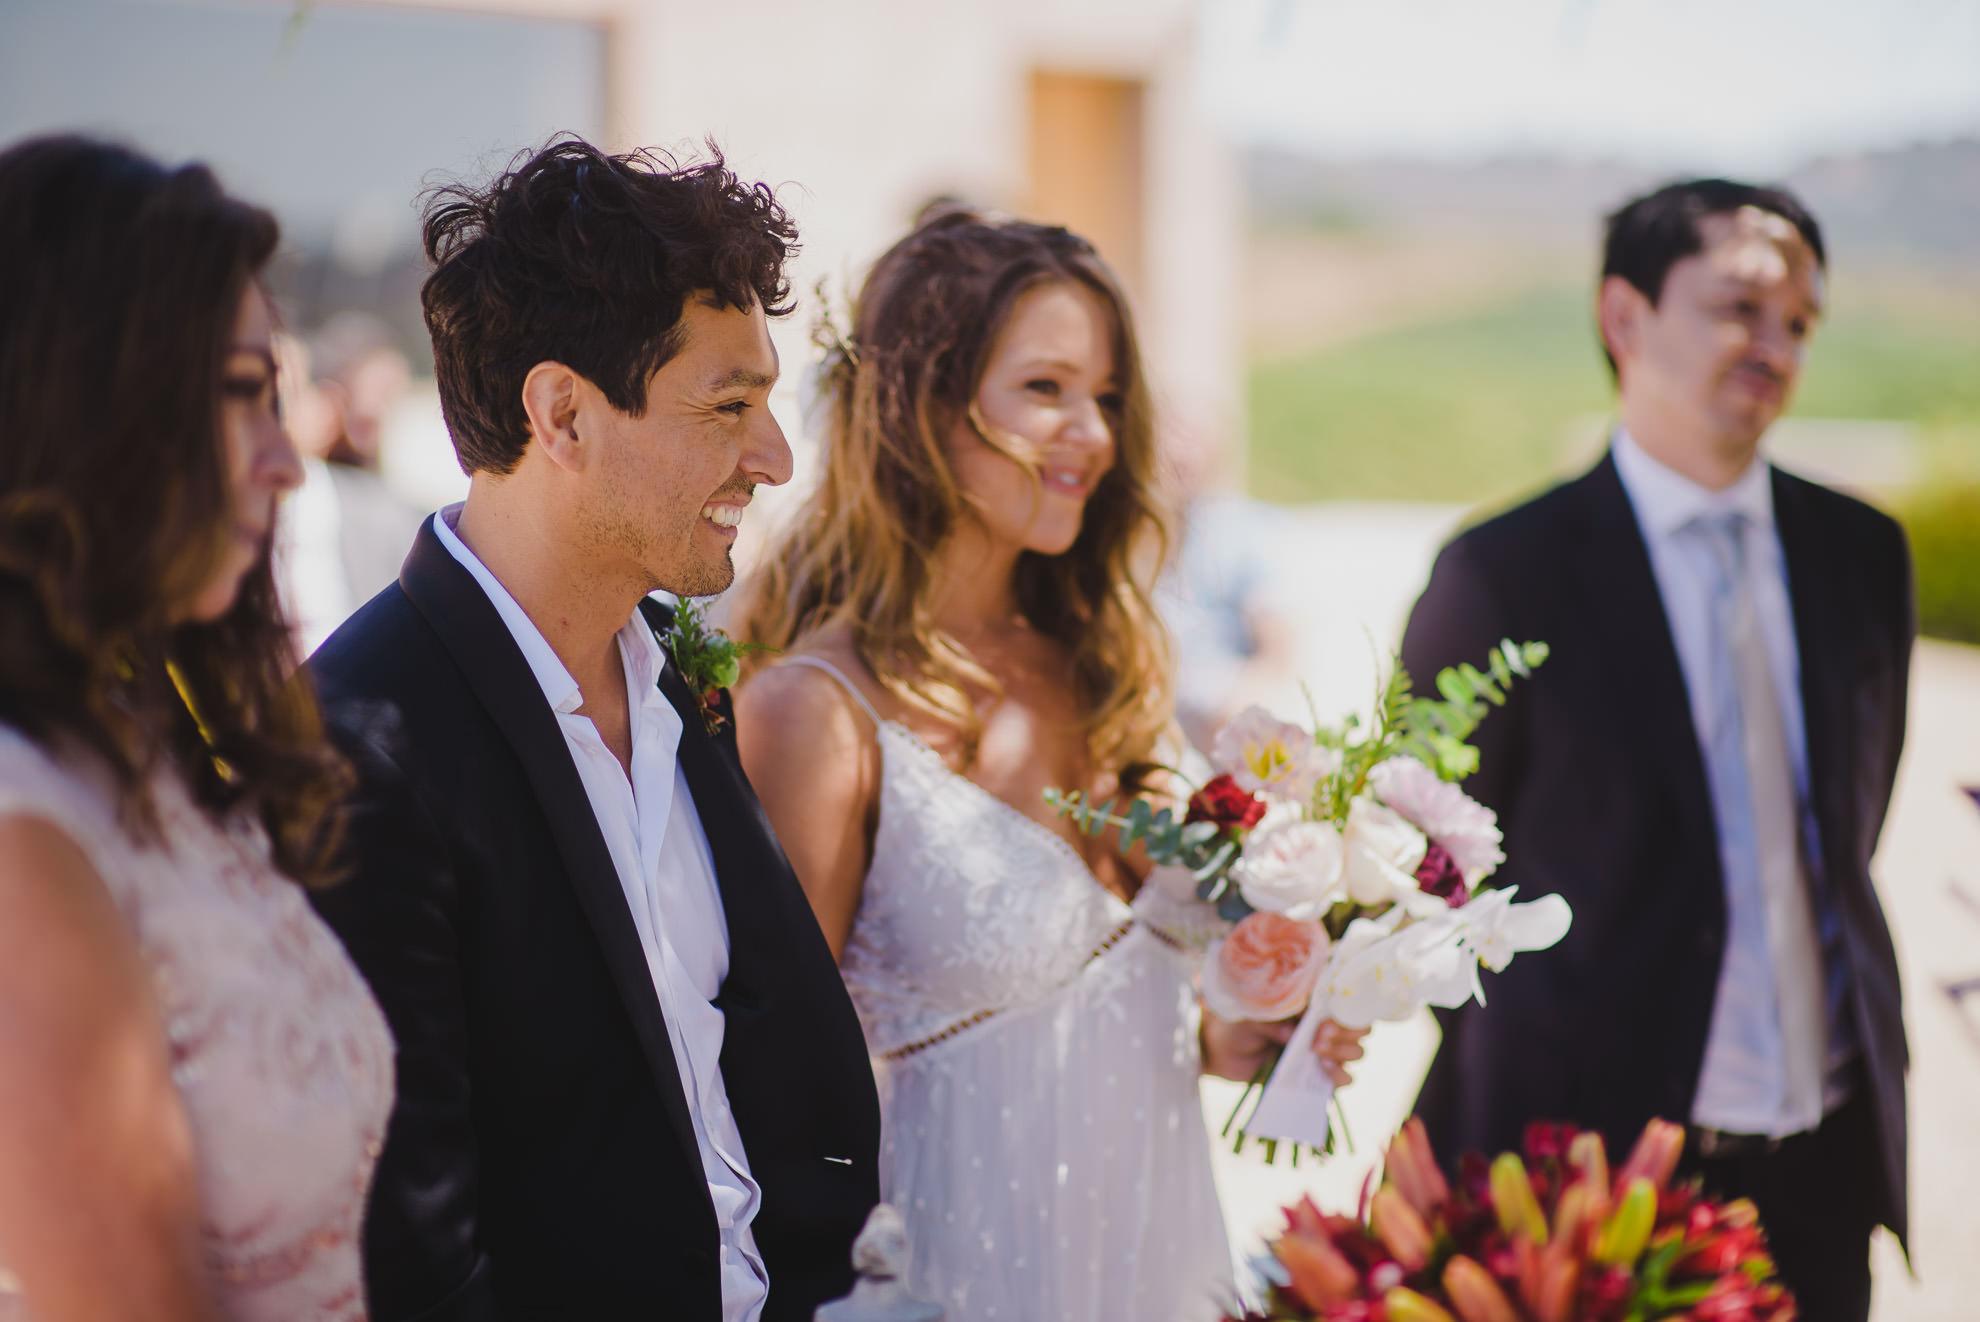 wedding casablanca valley-16.jpg